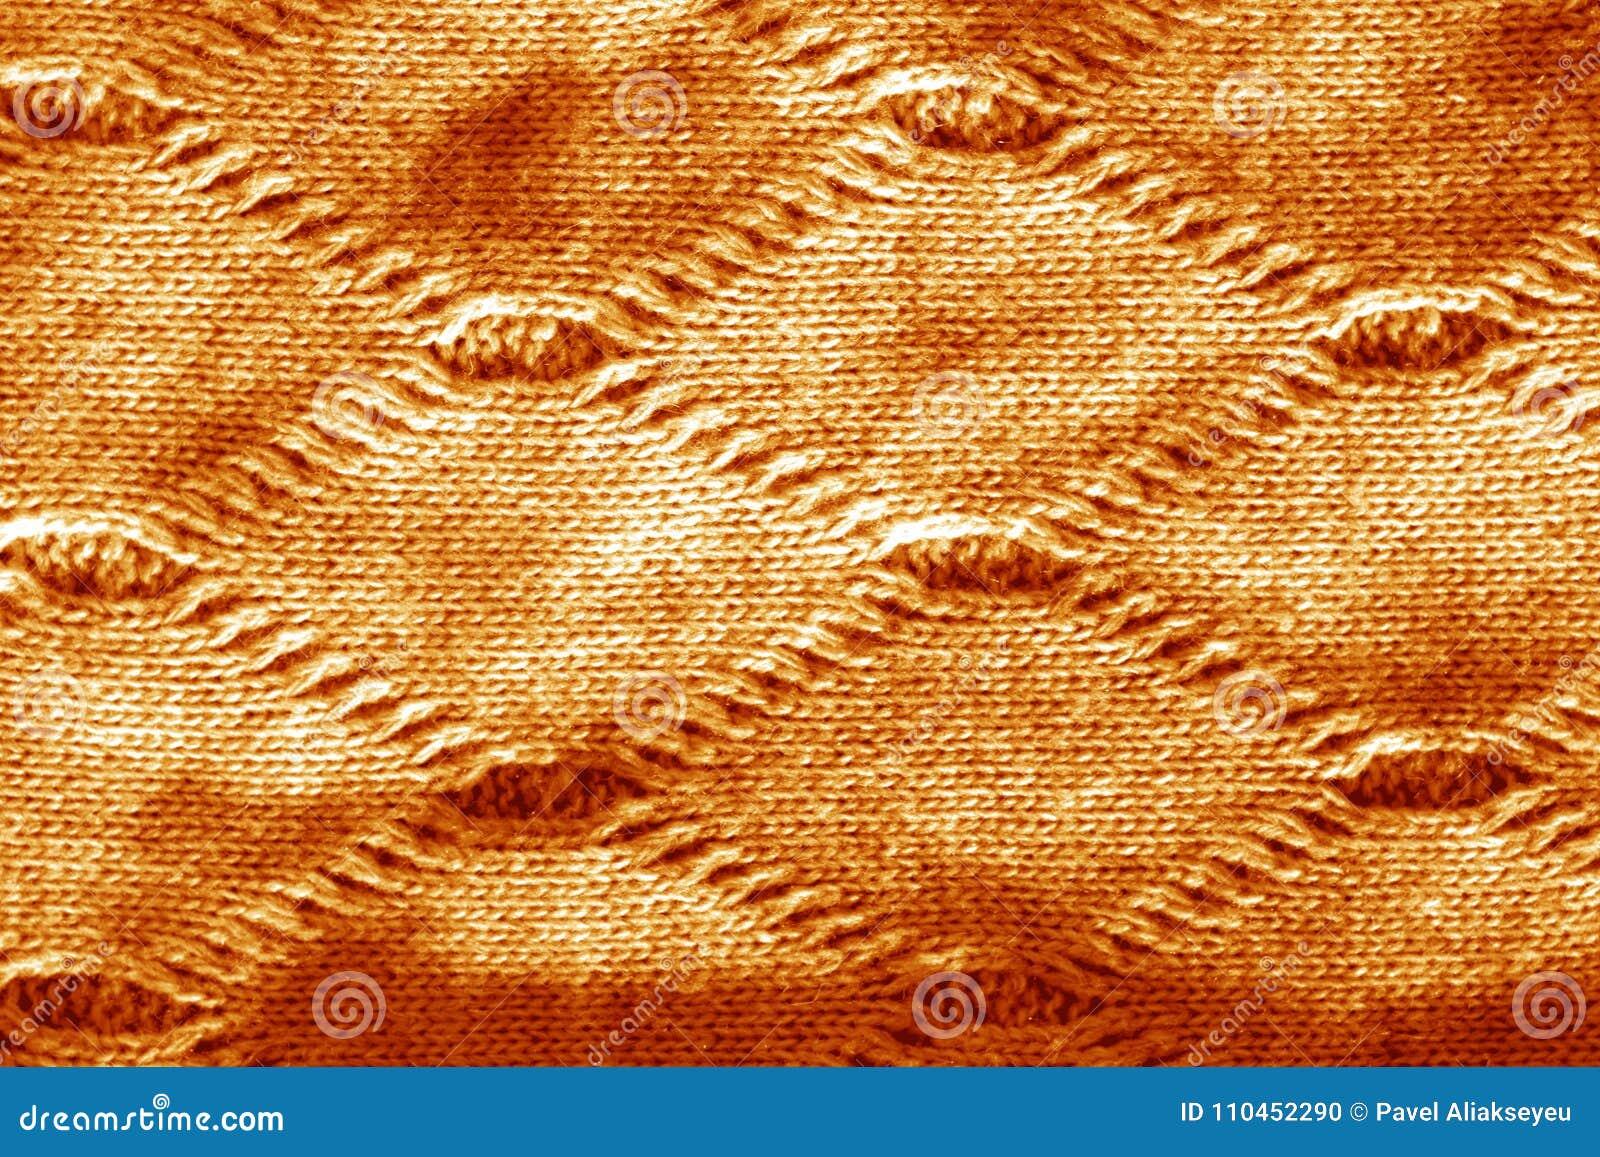 Sticka textur i orange signal